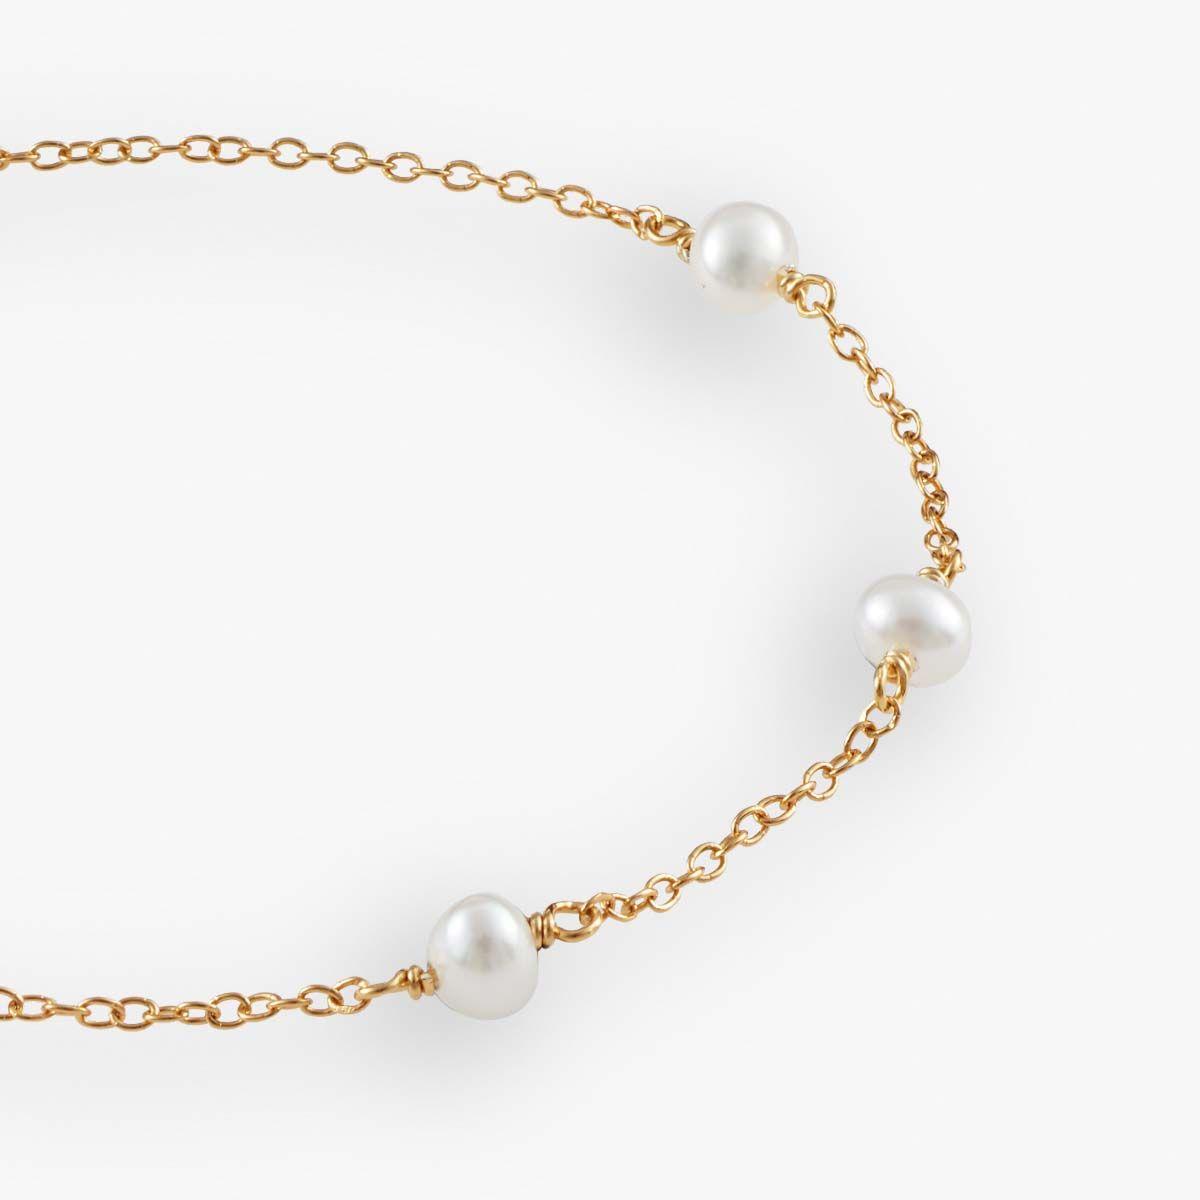 Romi - Perlenarmband - 18k vergoldet